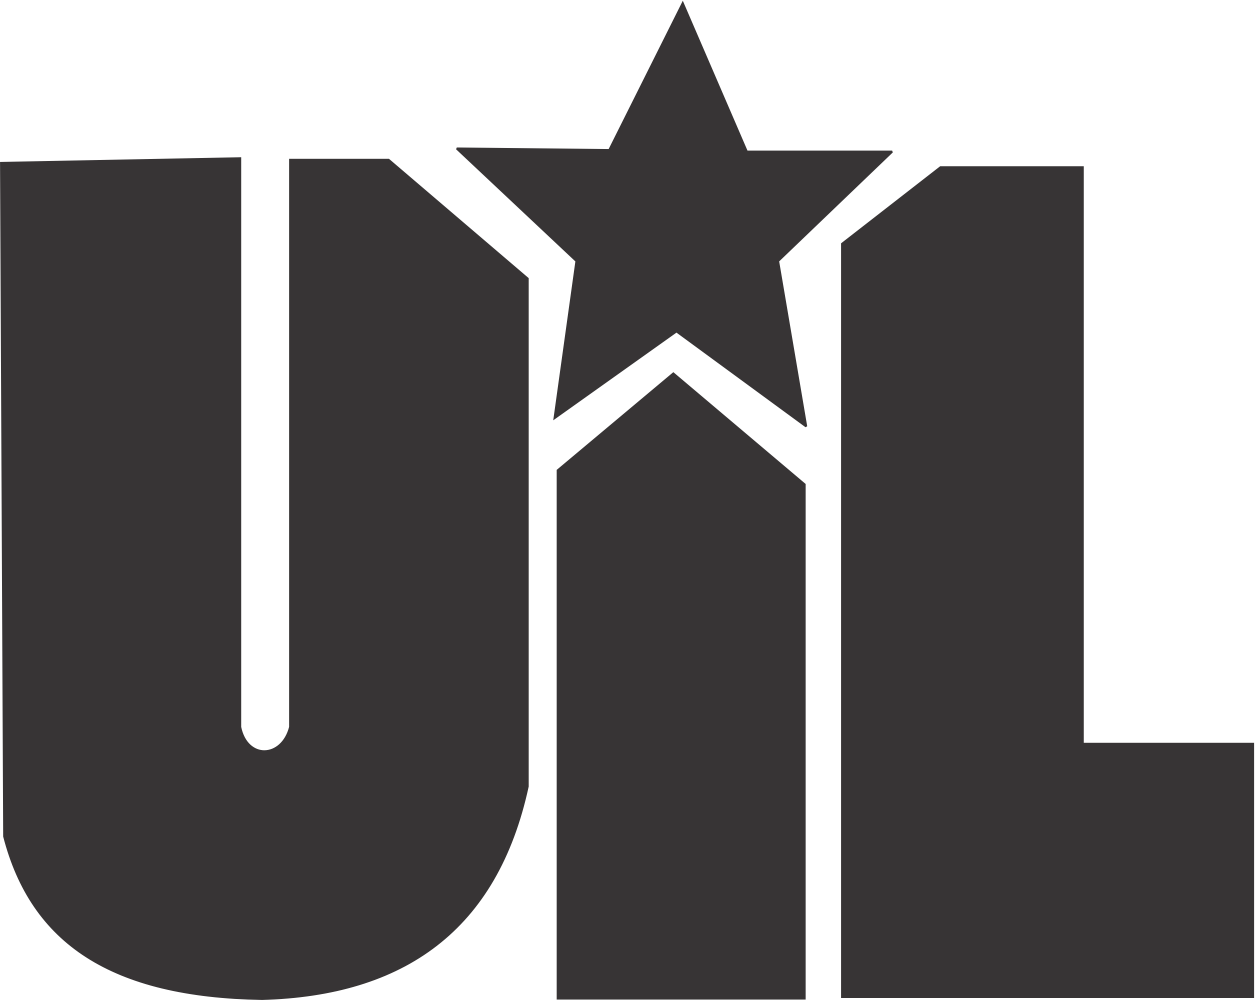 Uil Logos.